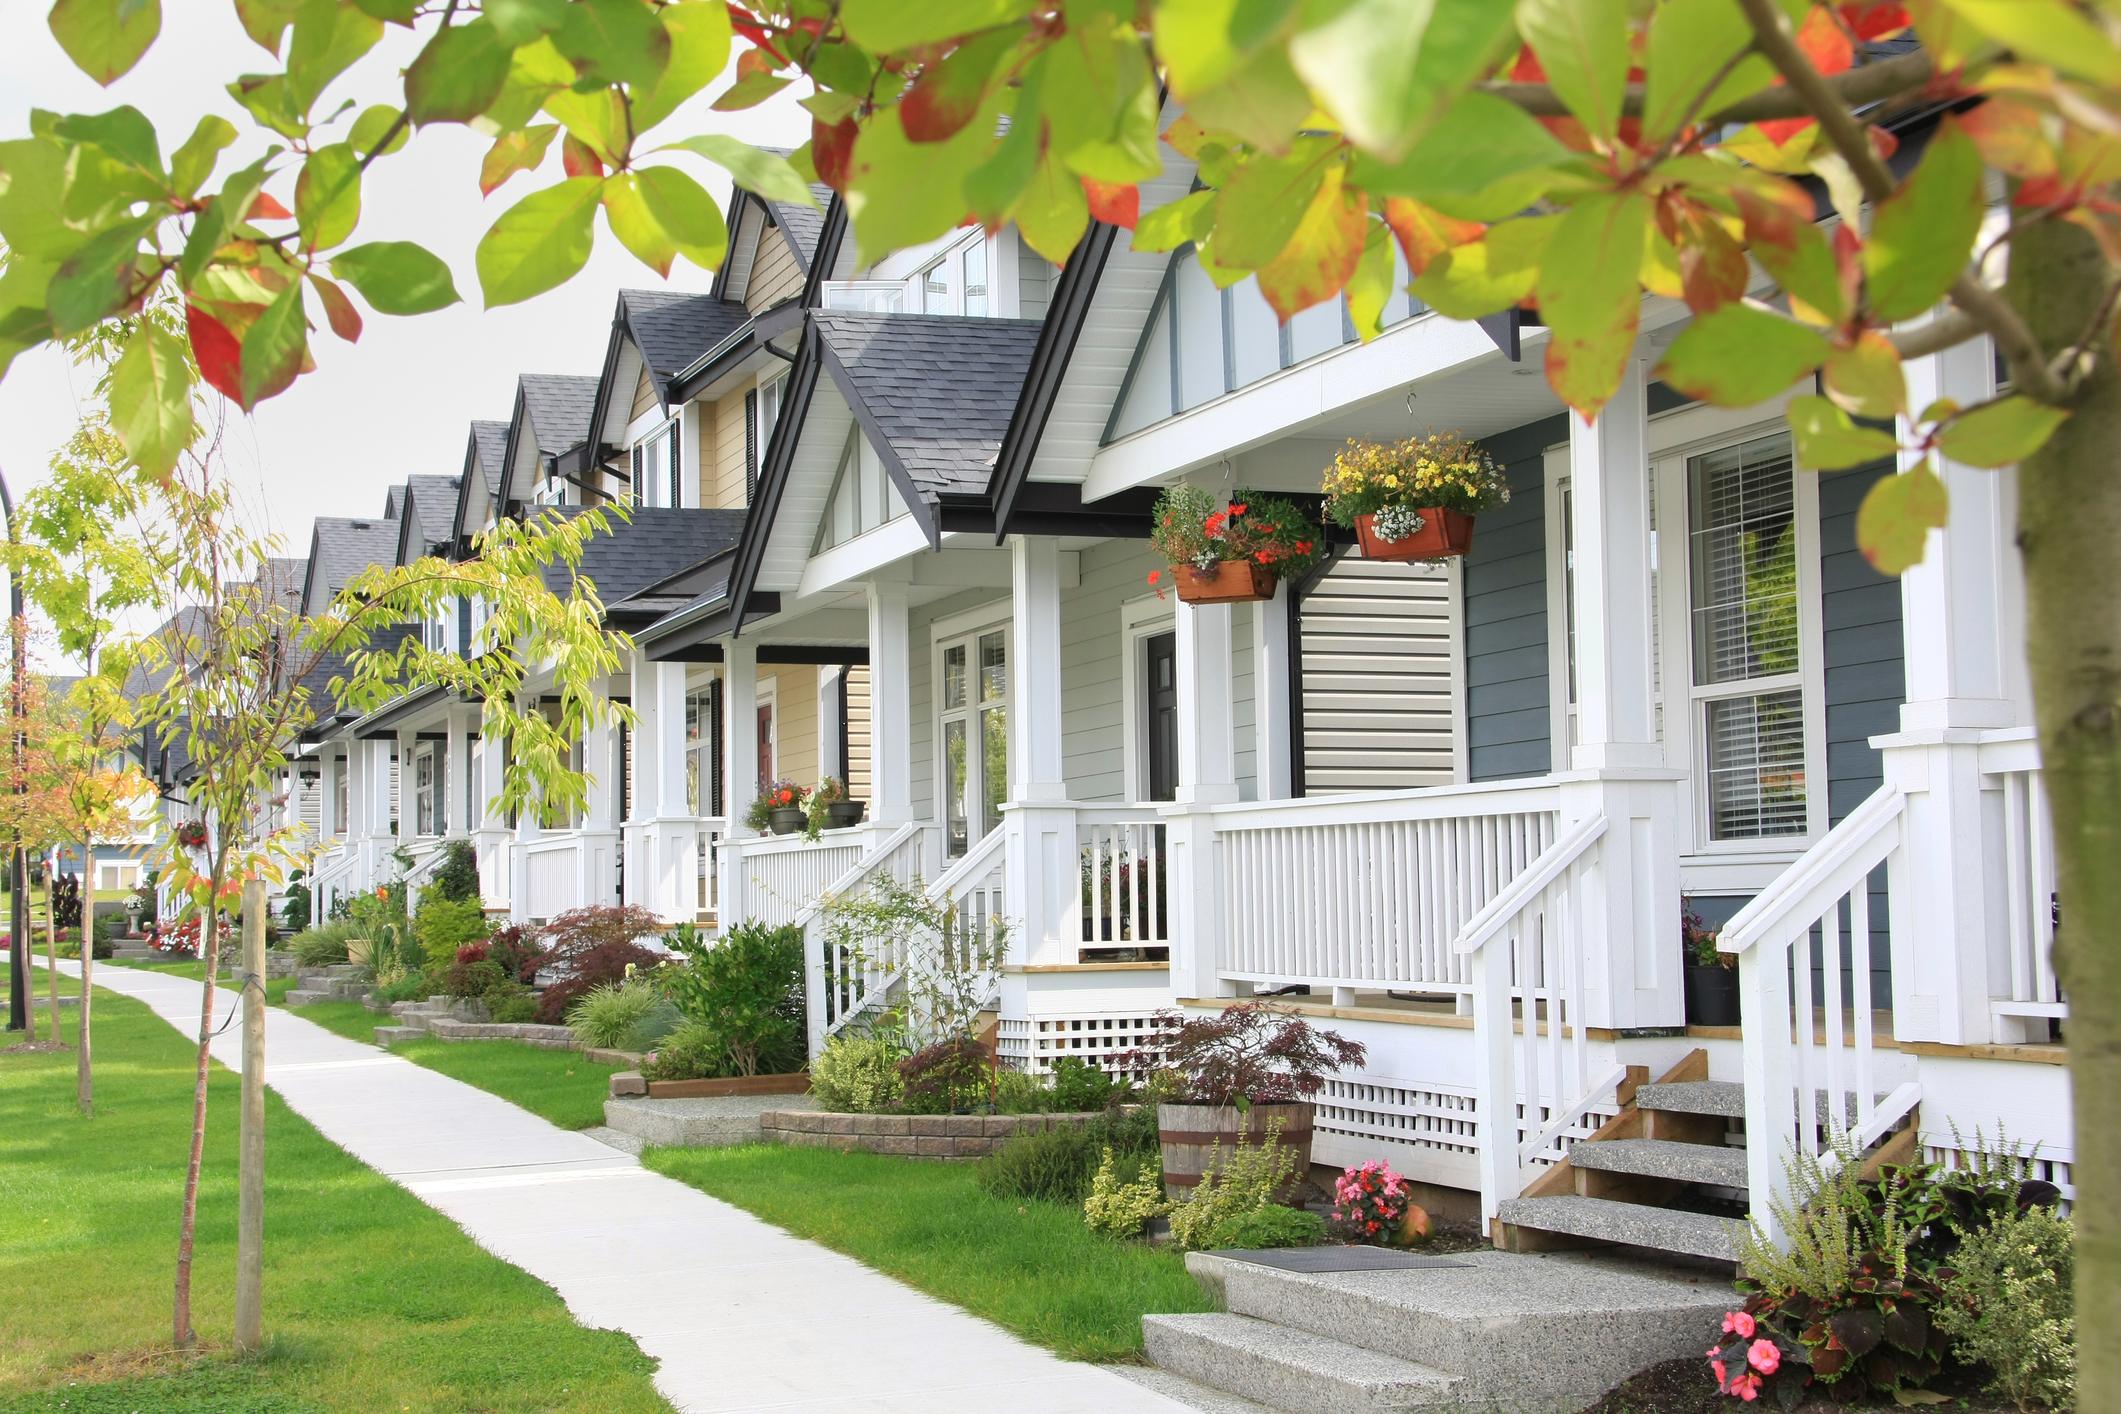 Exterior Row of Homes.jpg